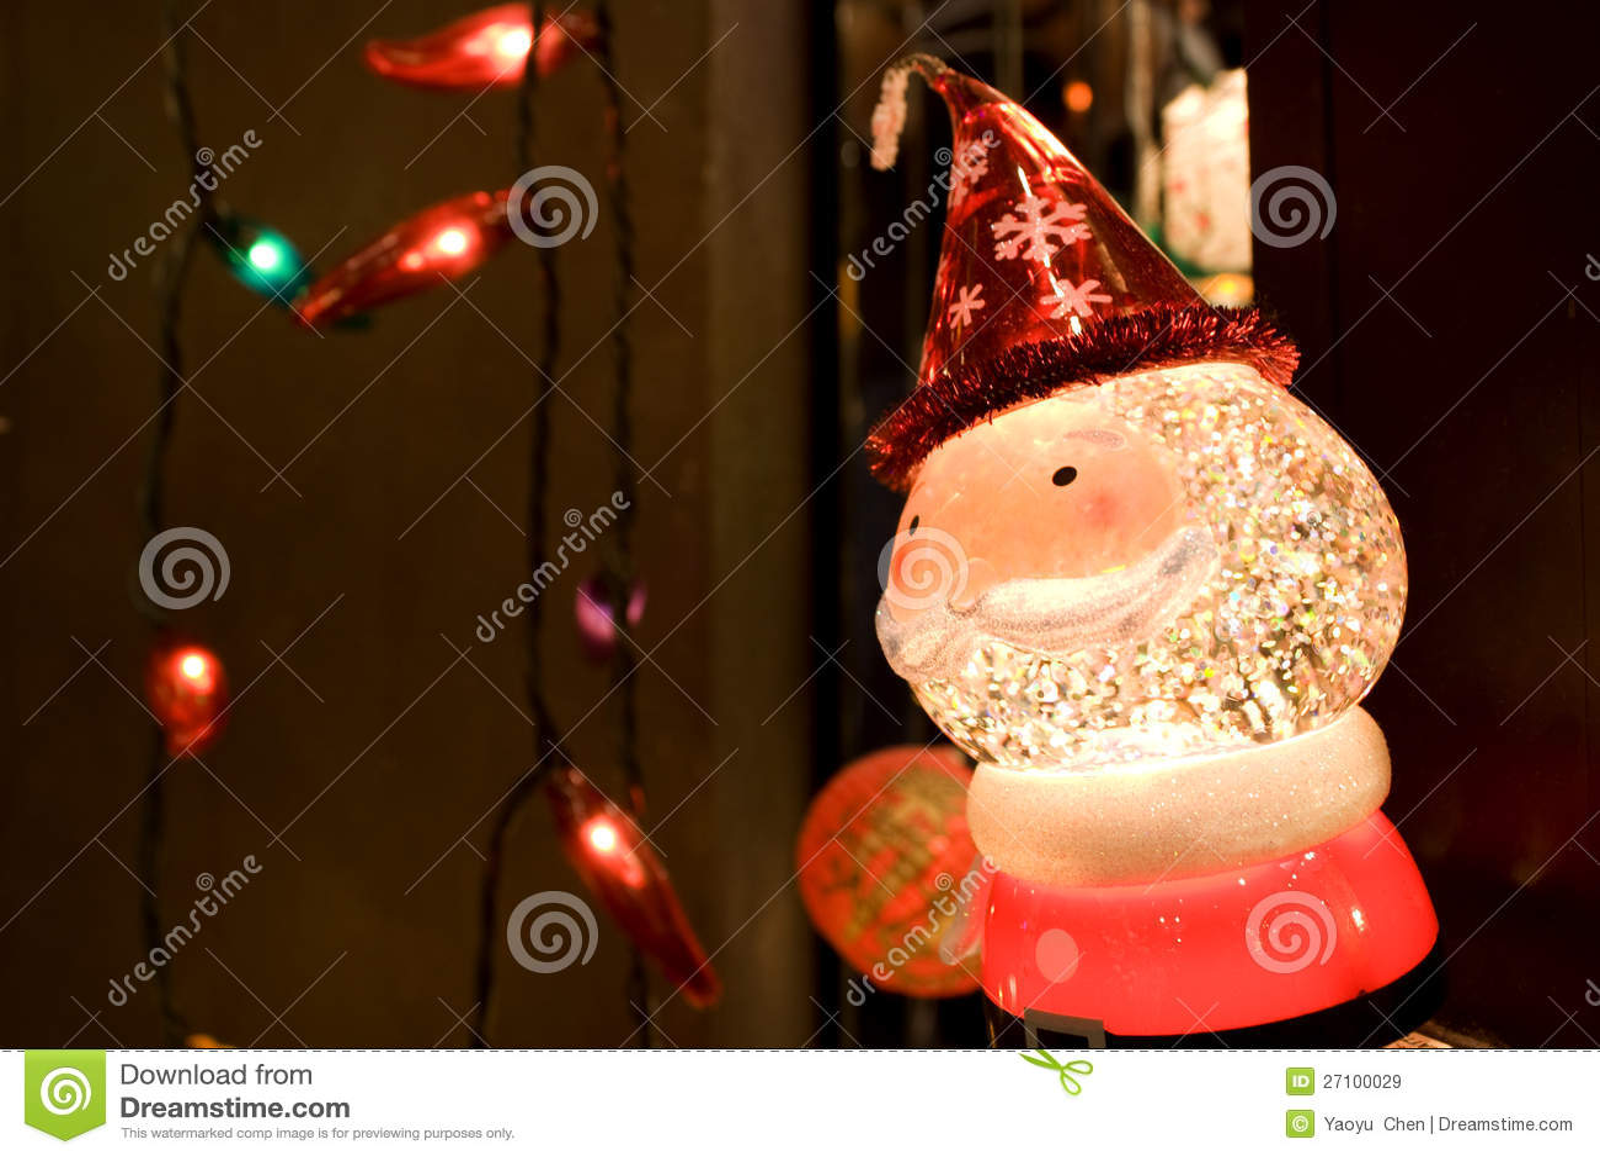 Santa claus christmas lights royalty free stock images